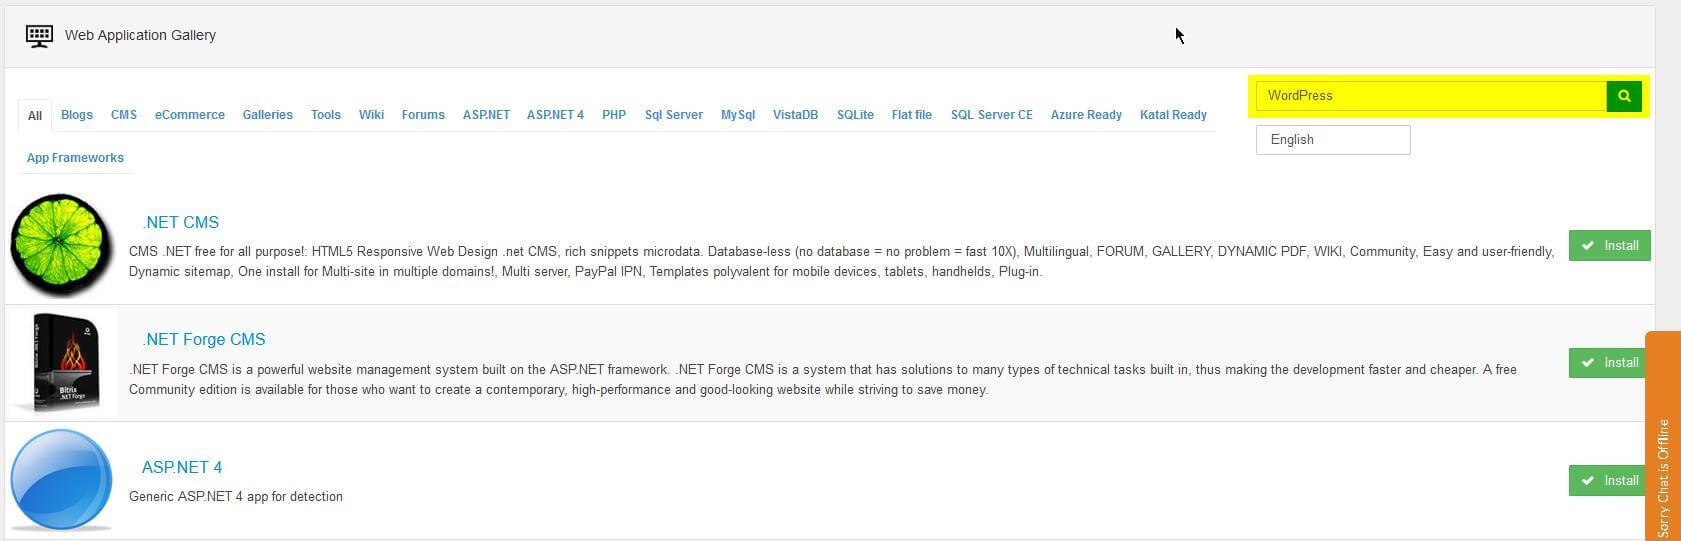 Type 'WordPress' in the Web App Gallery search box.